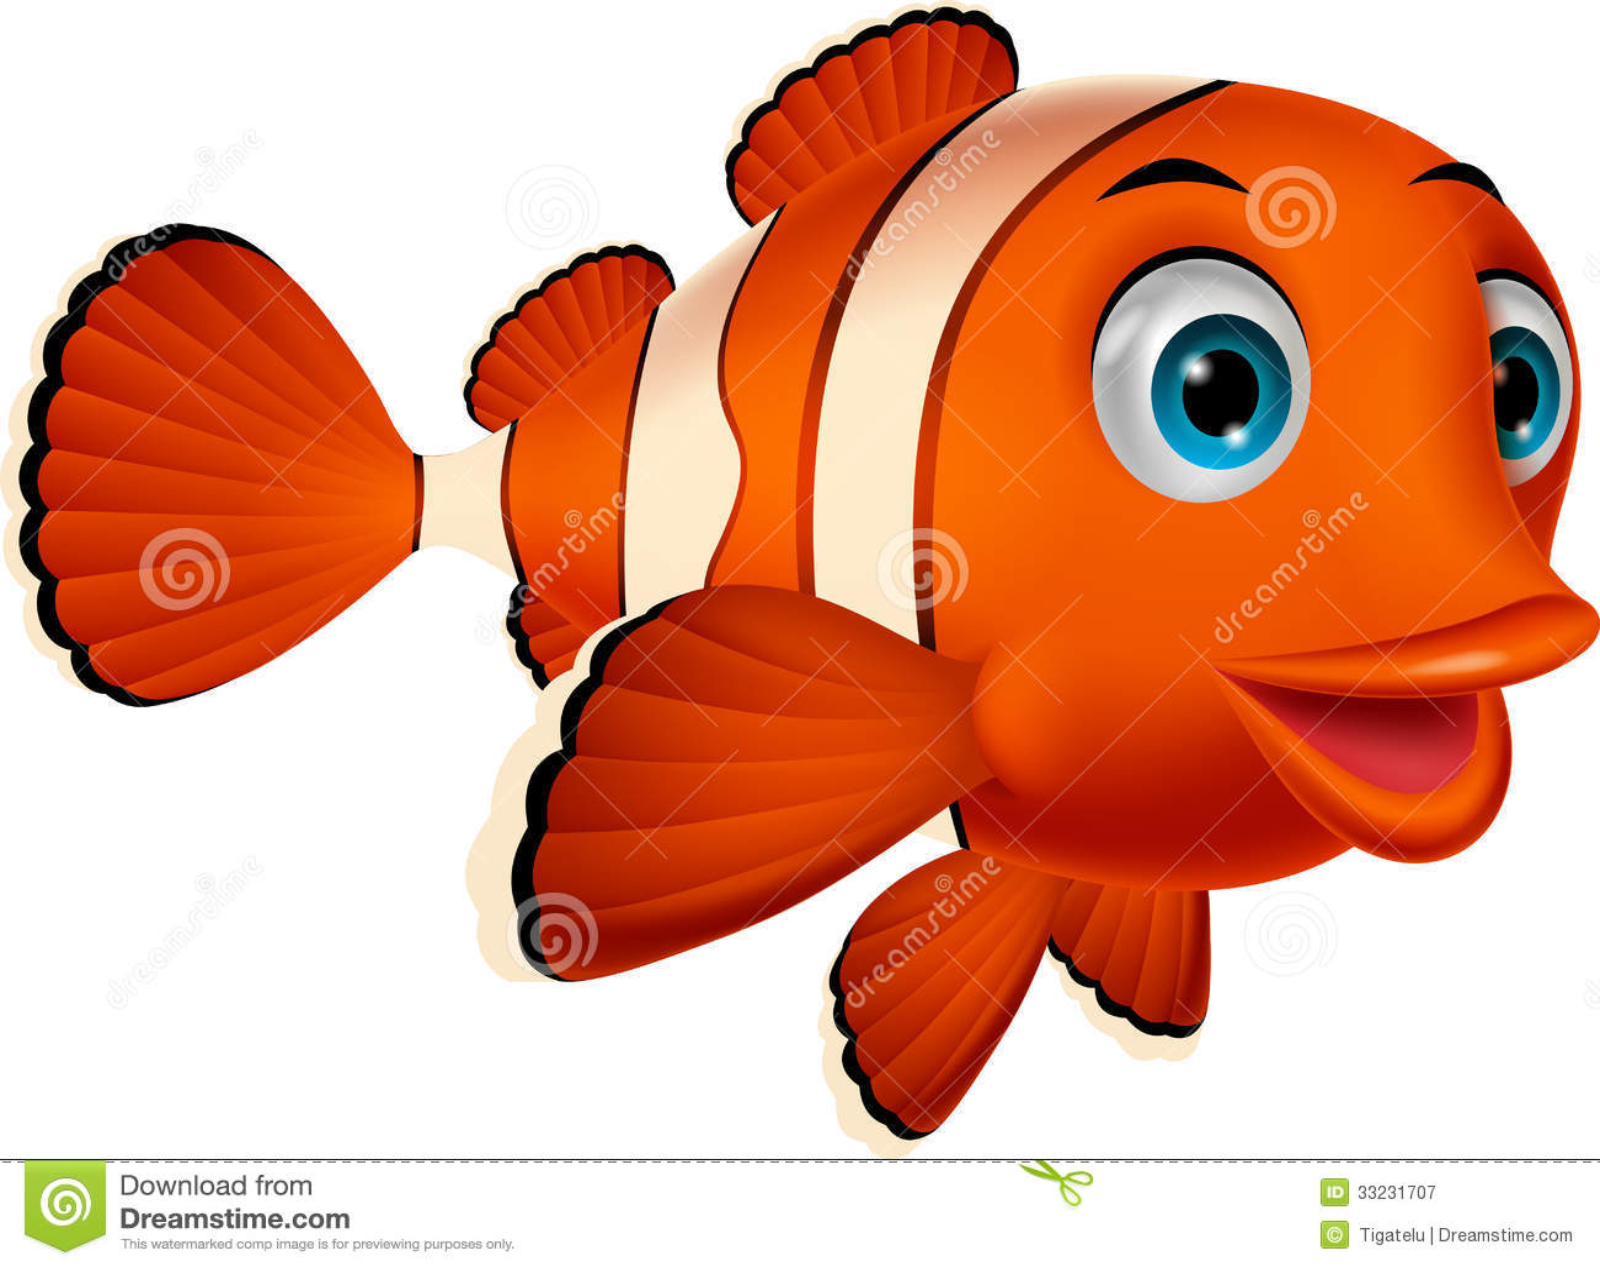 cute clown fish cartoon stock vector illustration of fish Seahorse Clip Art clown fish clip art printable free